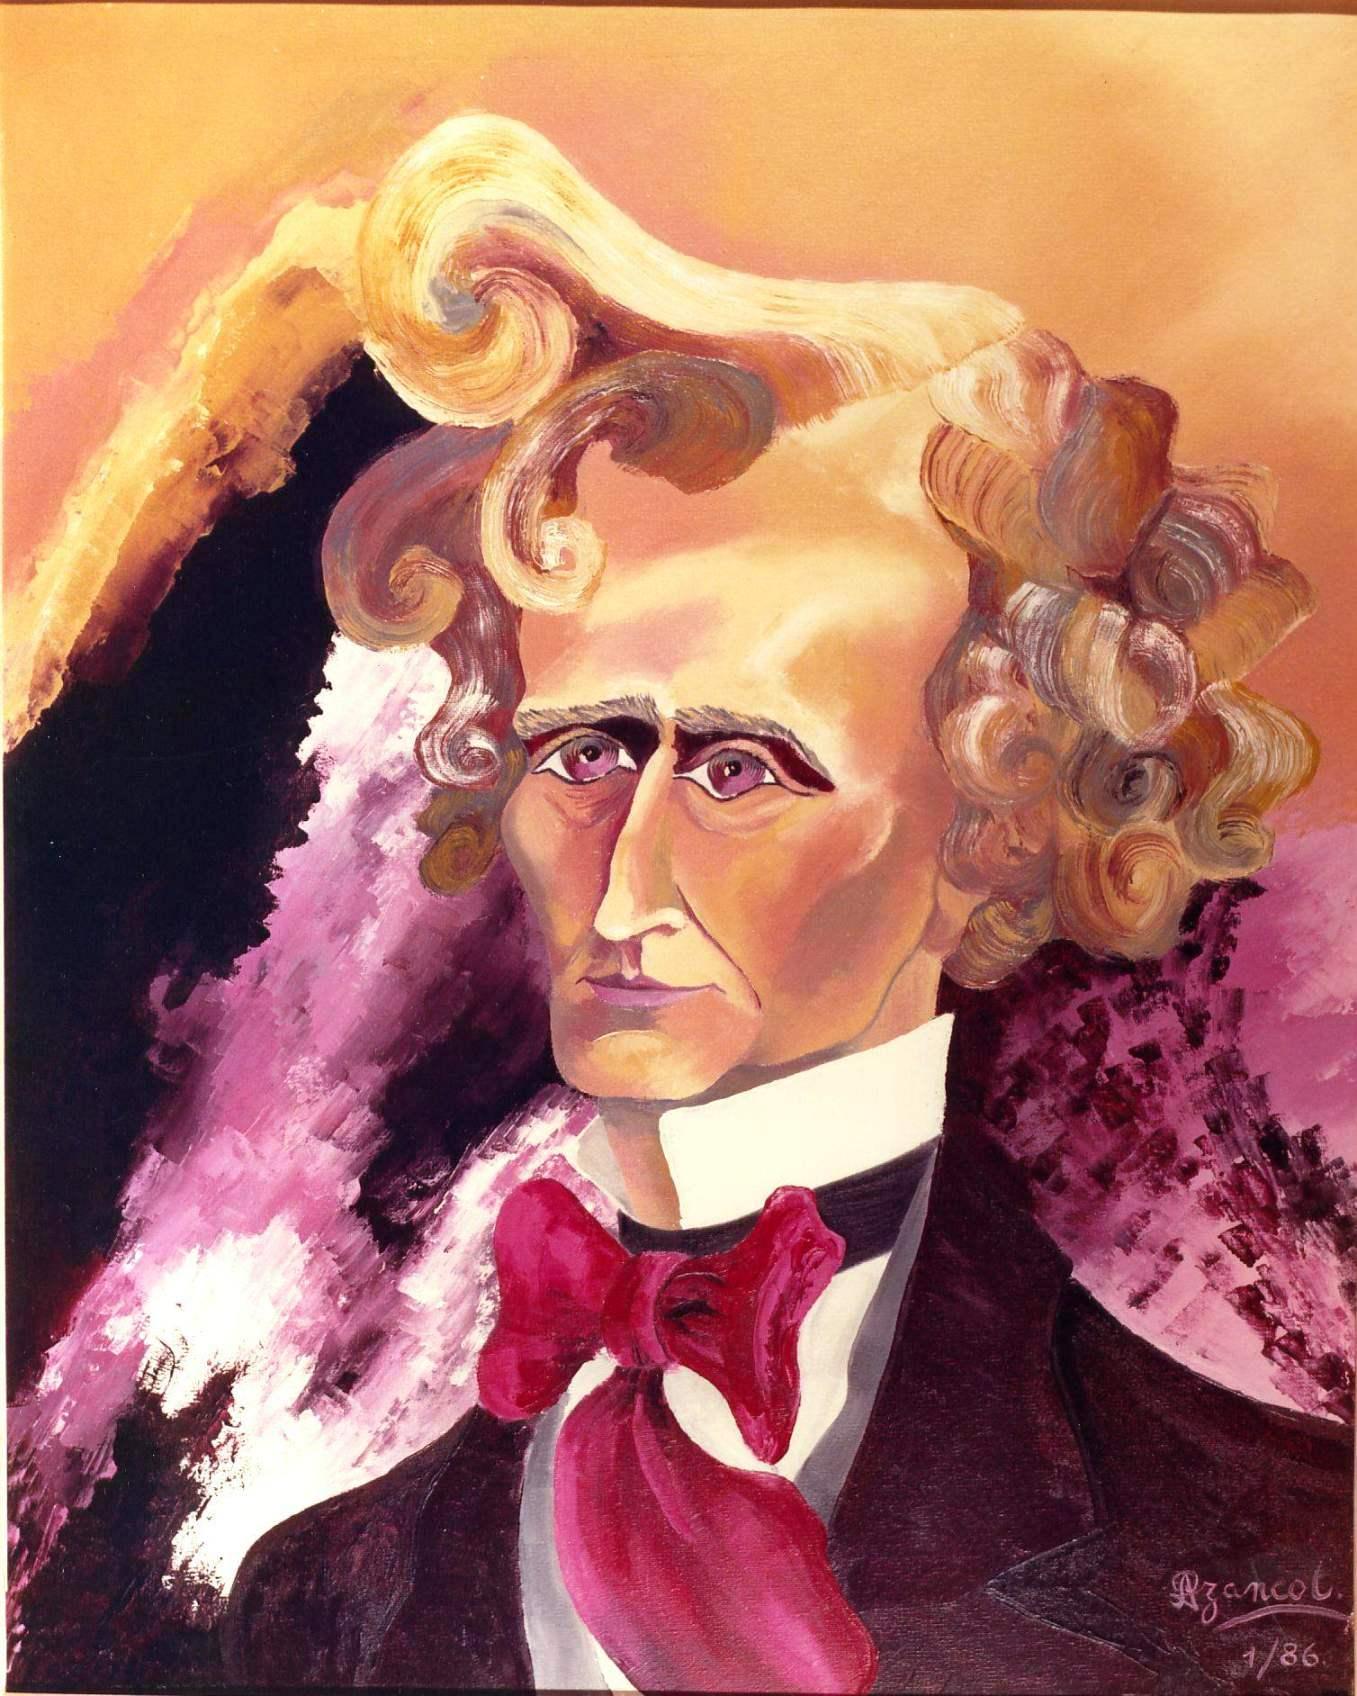 Louis HÉCTOR BERLIOZ portrait